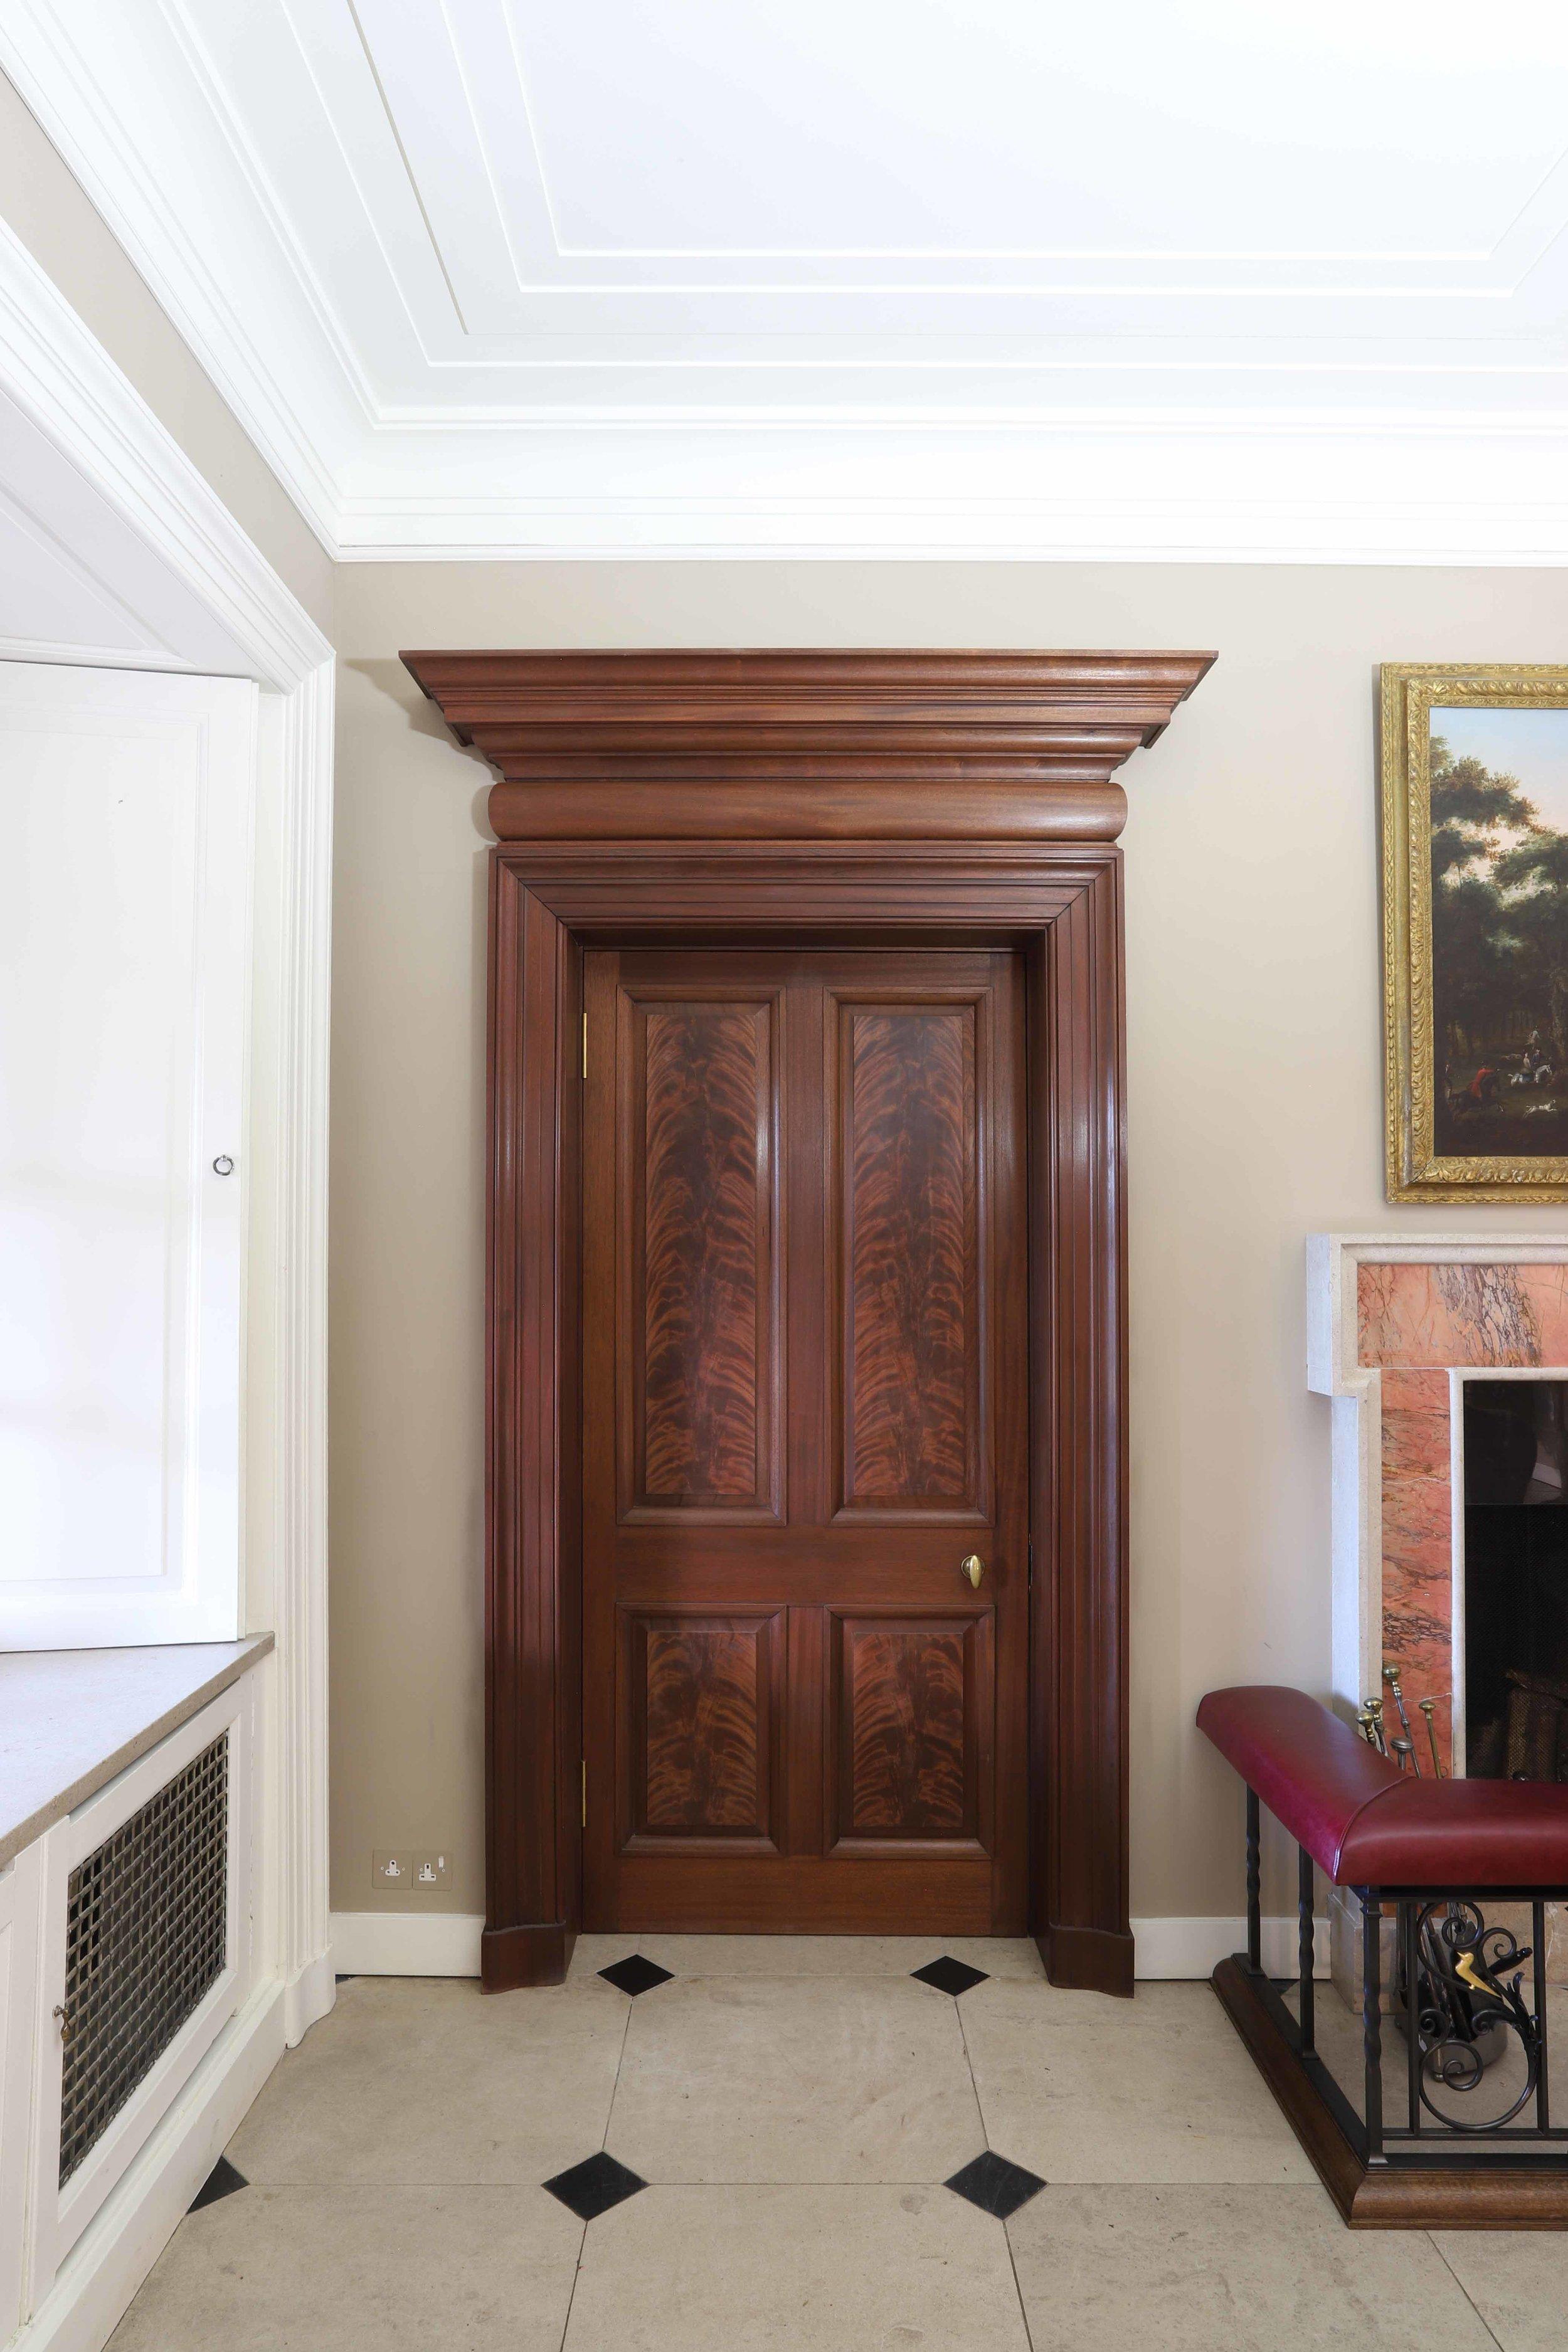 Period Mahogany door set with burr veneered panels, Marchmont house, Scottish borders.